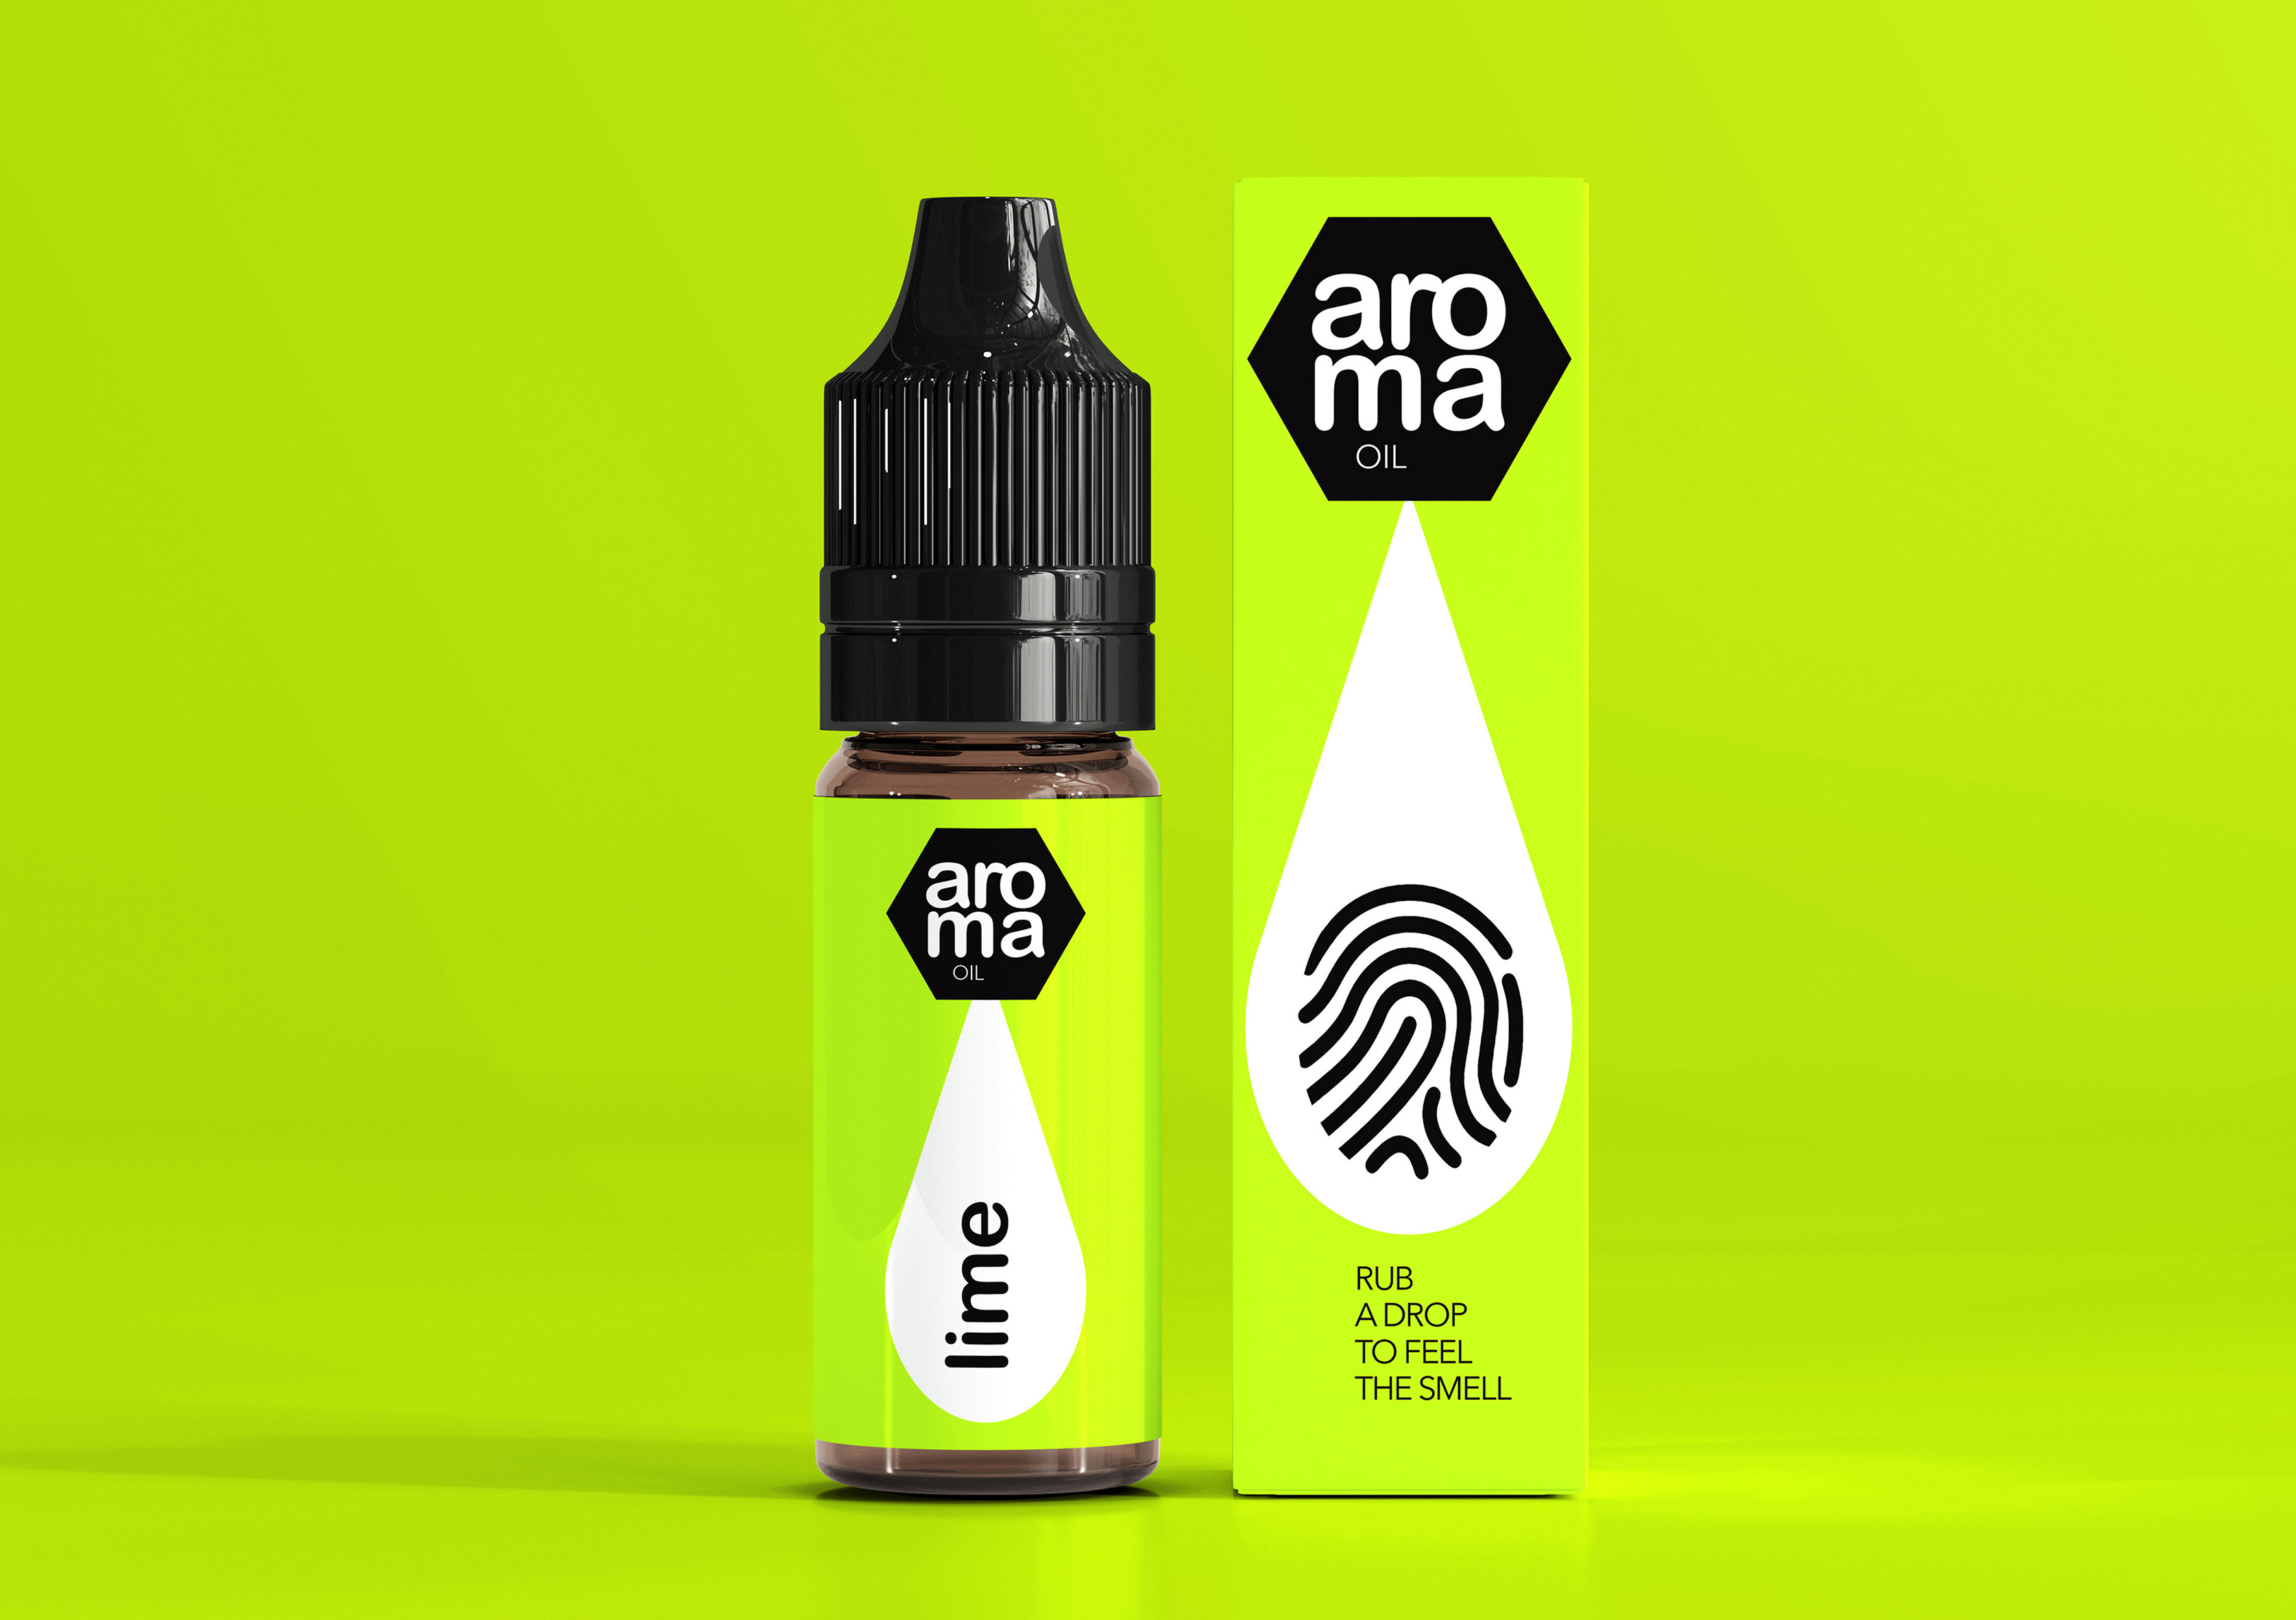 Aroma Oil Concept Packaging Design by Student Tanya Dunaeva